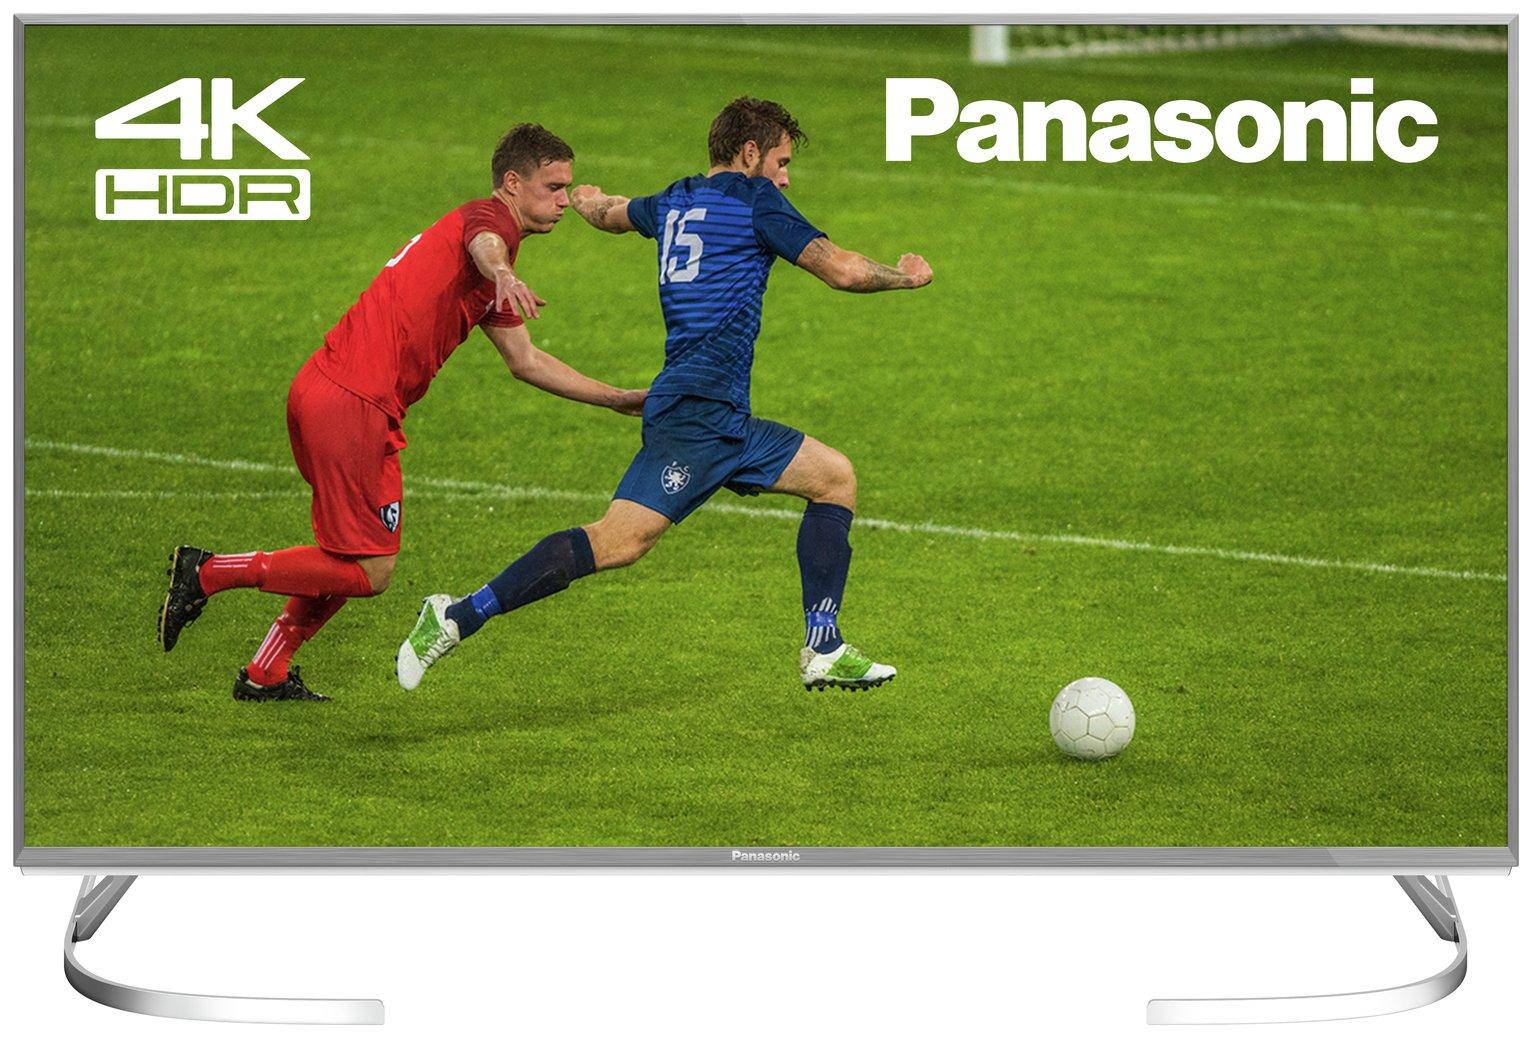 Panasonic TX-58EX700B 58 Inch Smart 4K Ultra HD TV with HDR